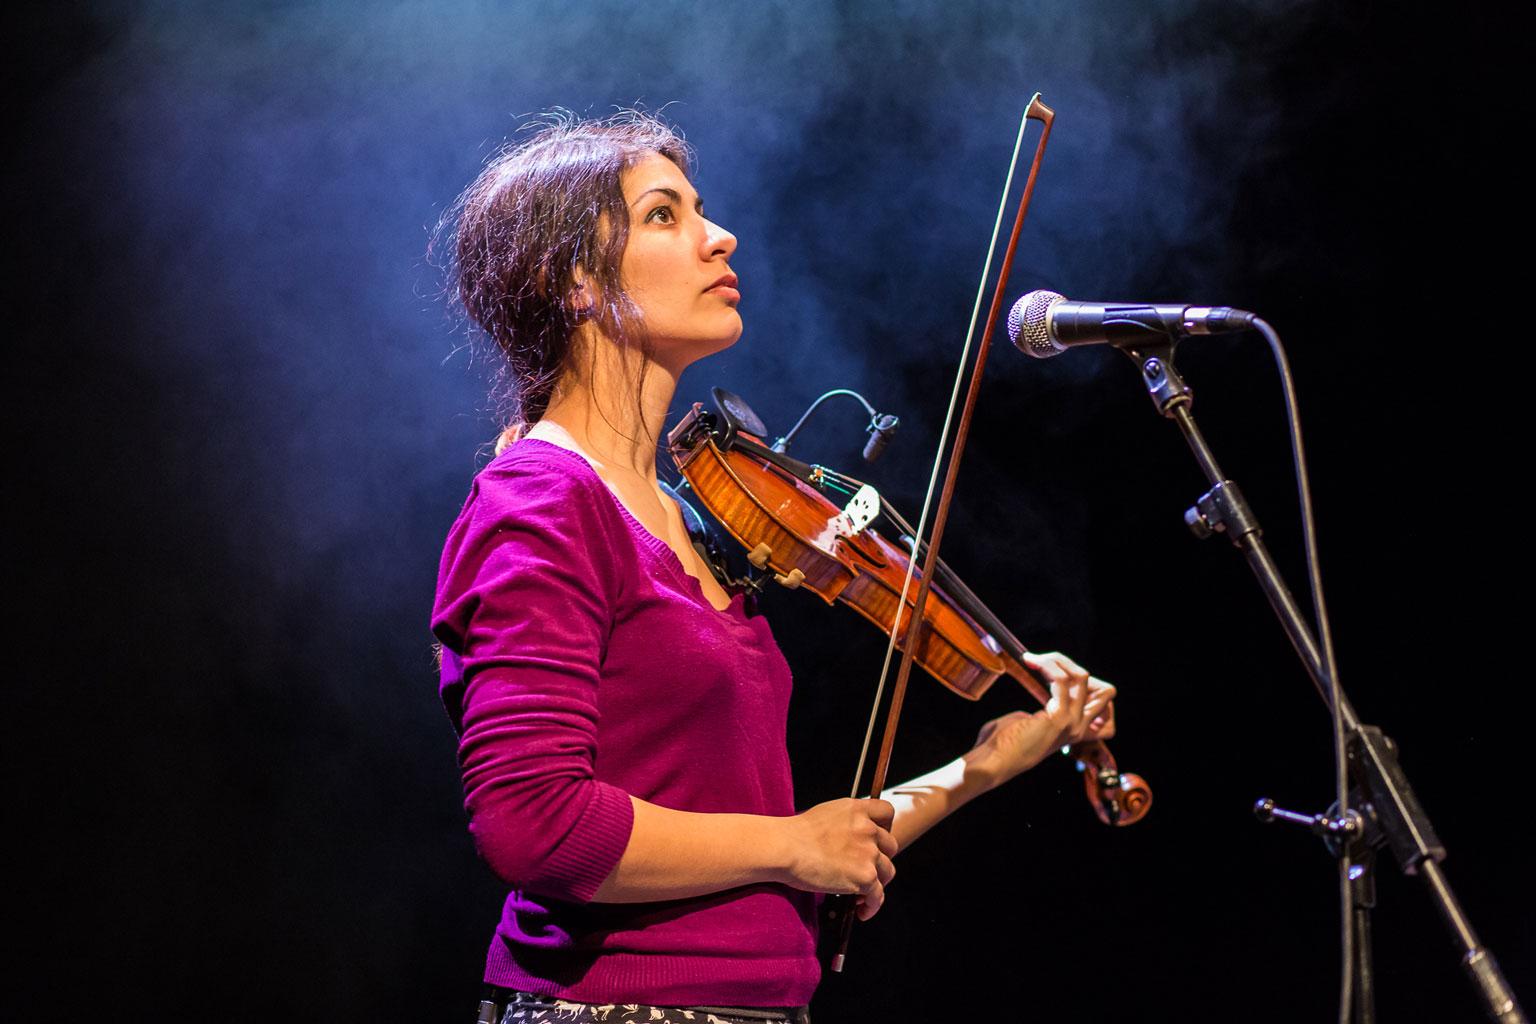 Feuerbach Quartett - Jamila Musayeva